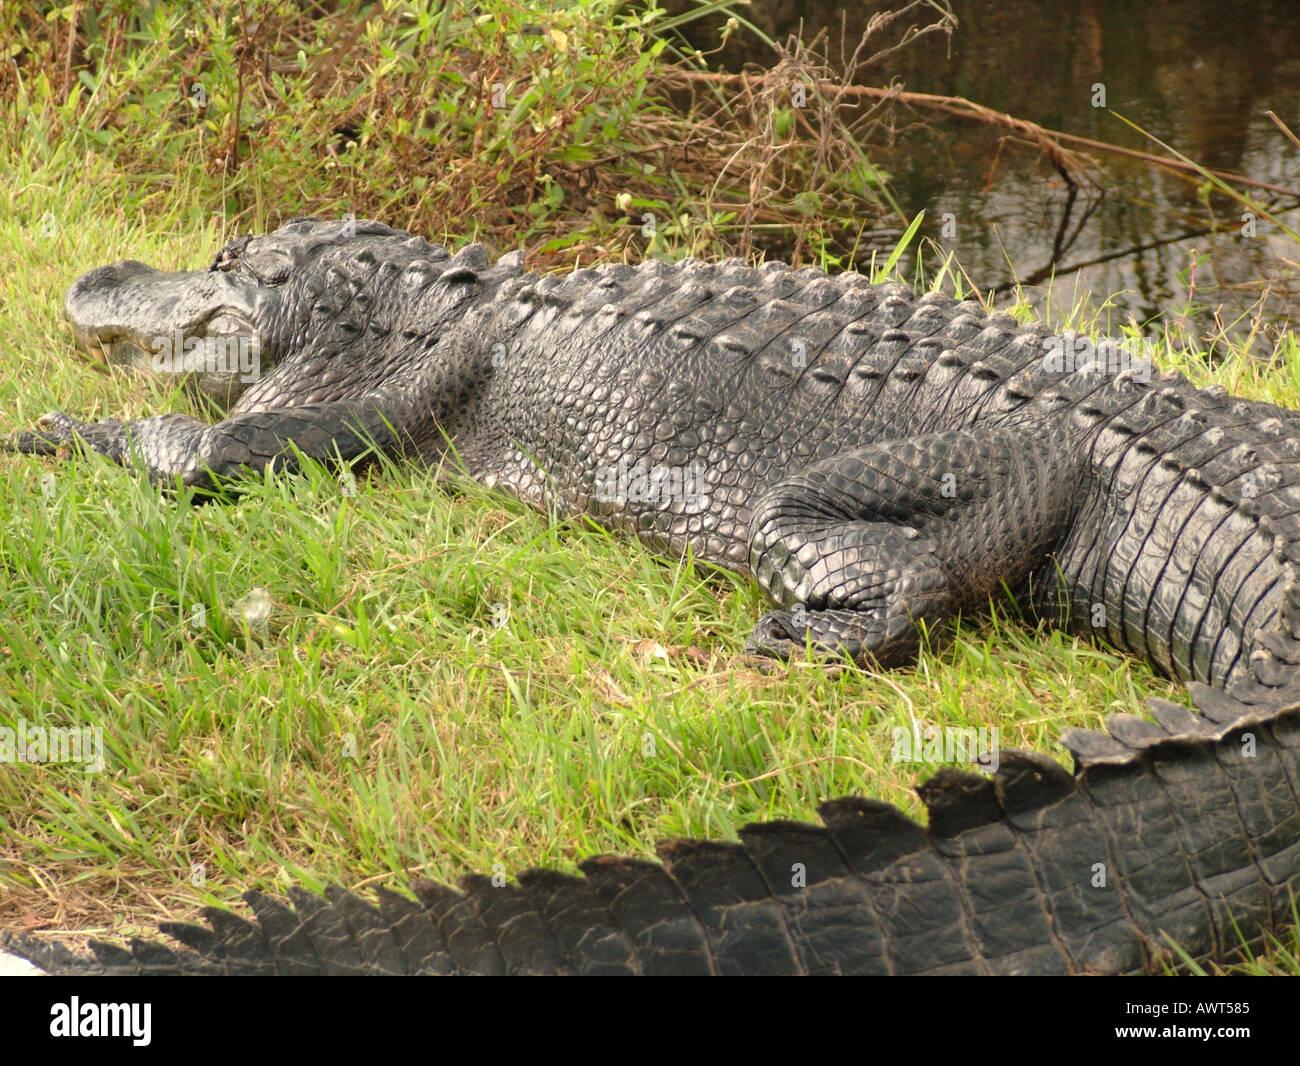 AJD39498, Everglades National Park, FL, Florida Foto Stock